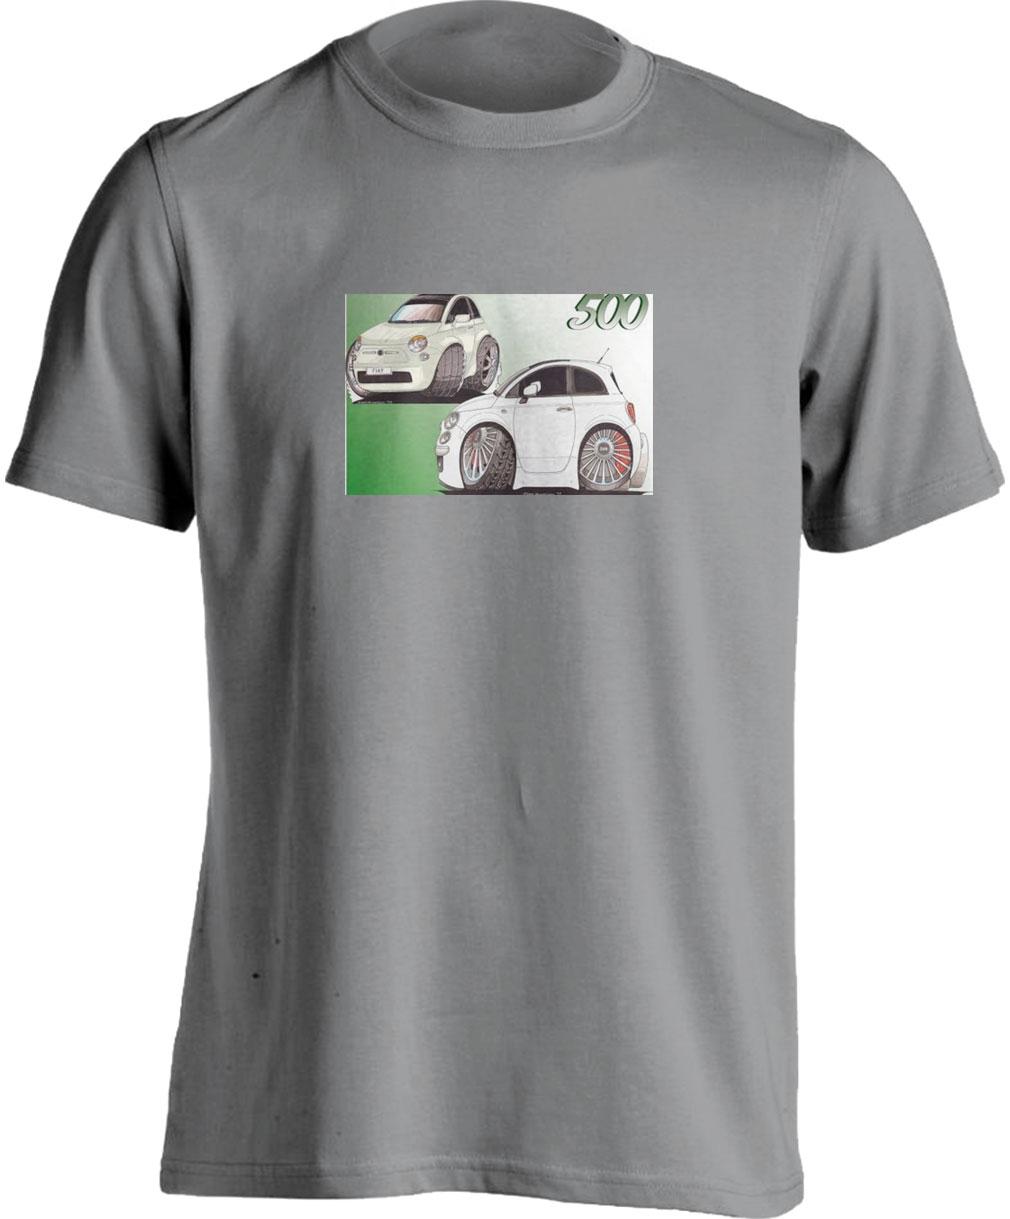 T Shirt 500 Koolart 2581